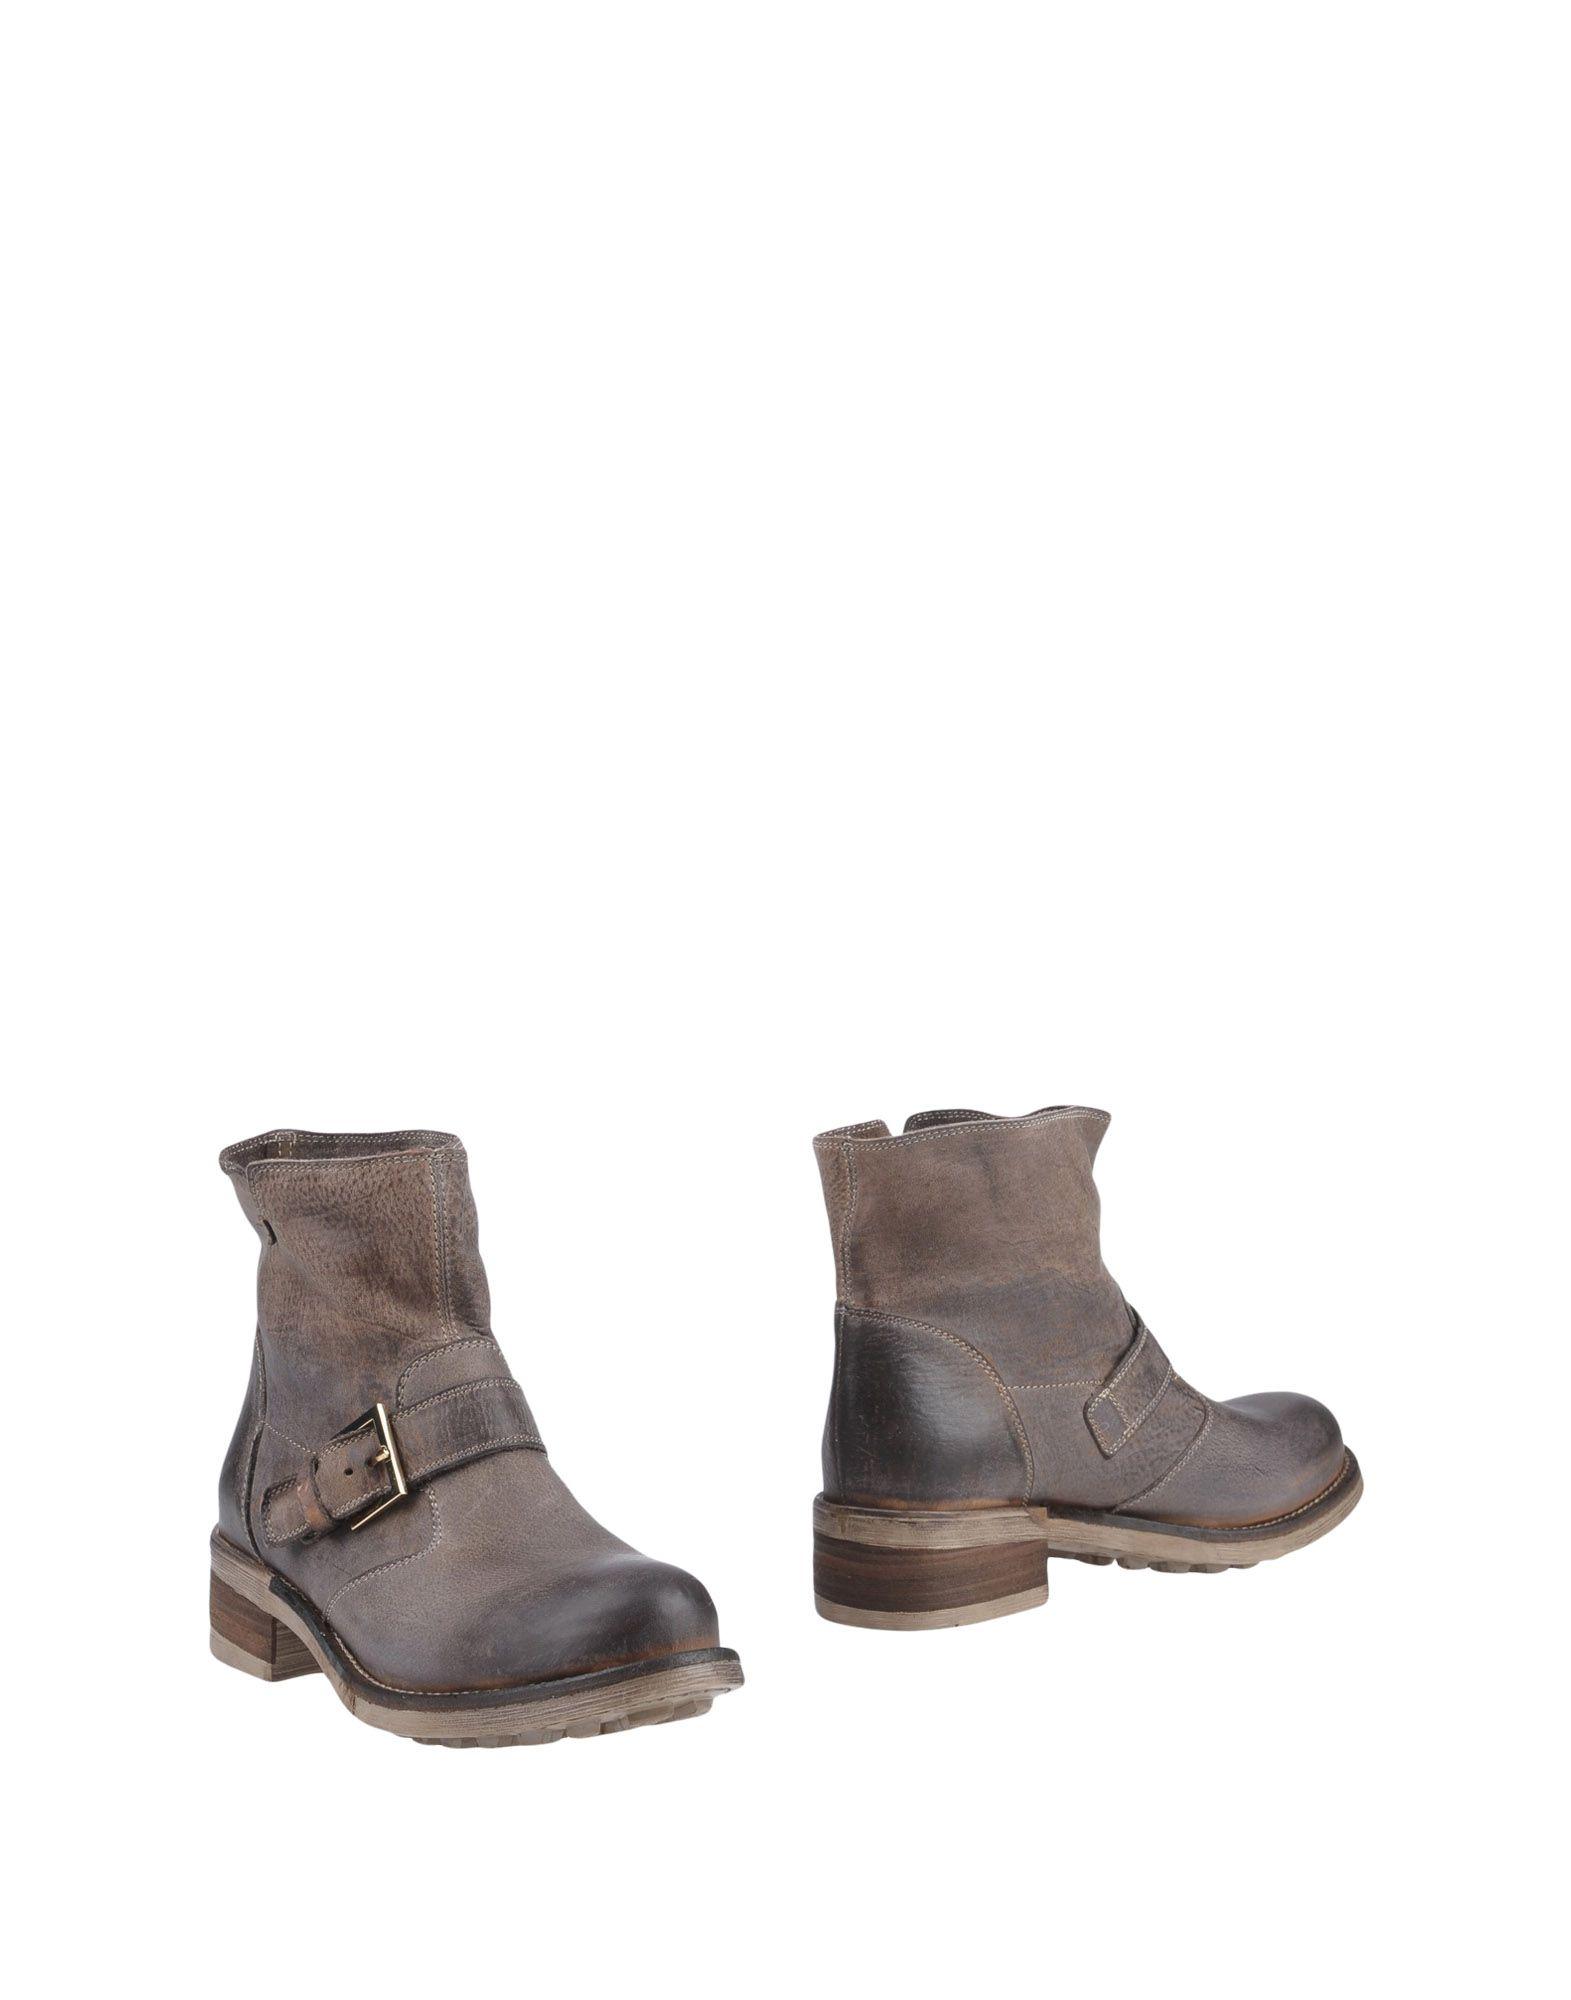 FABBRICA MORICHETTI Полусапоги и высокие ботинки цены онлайн